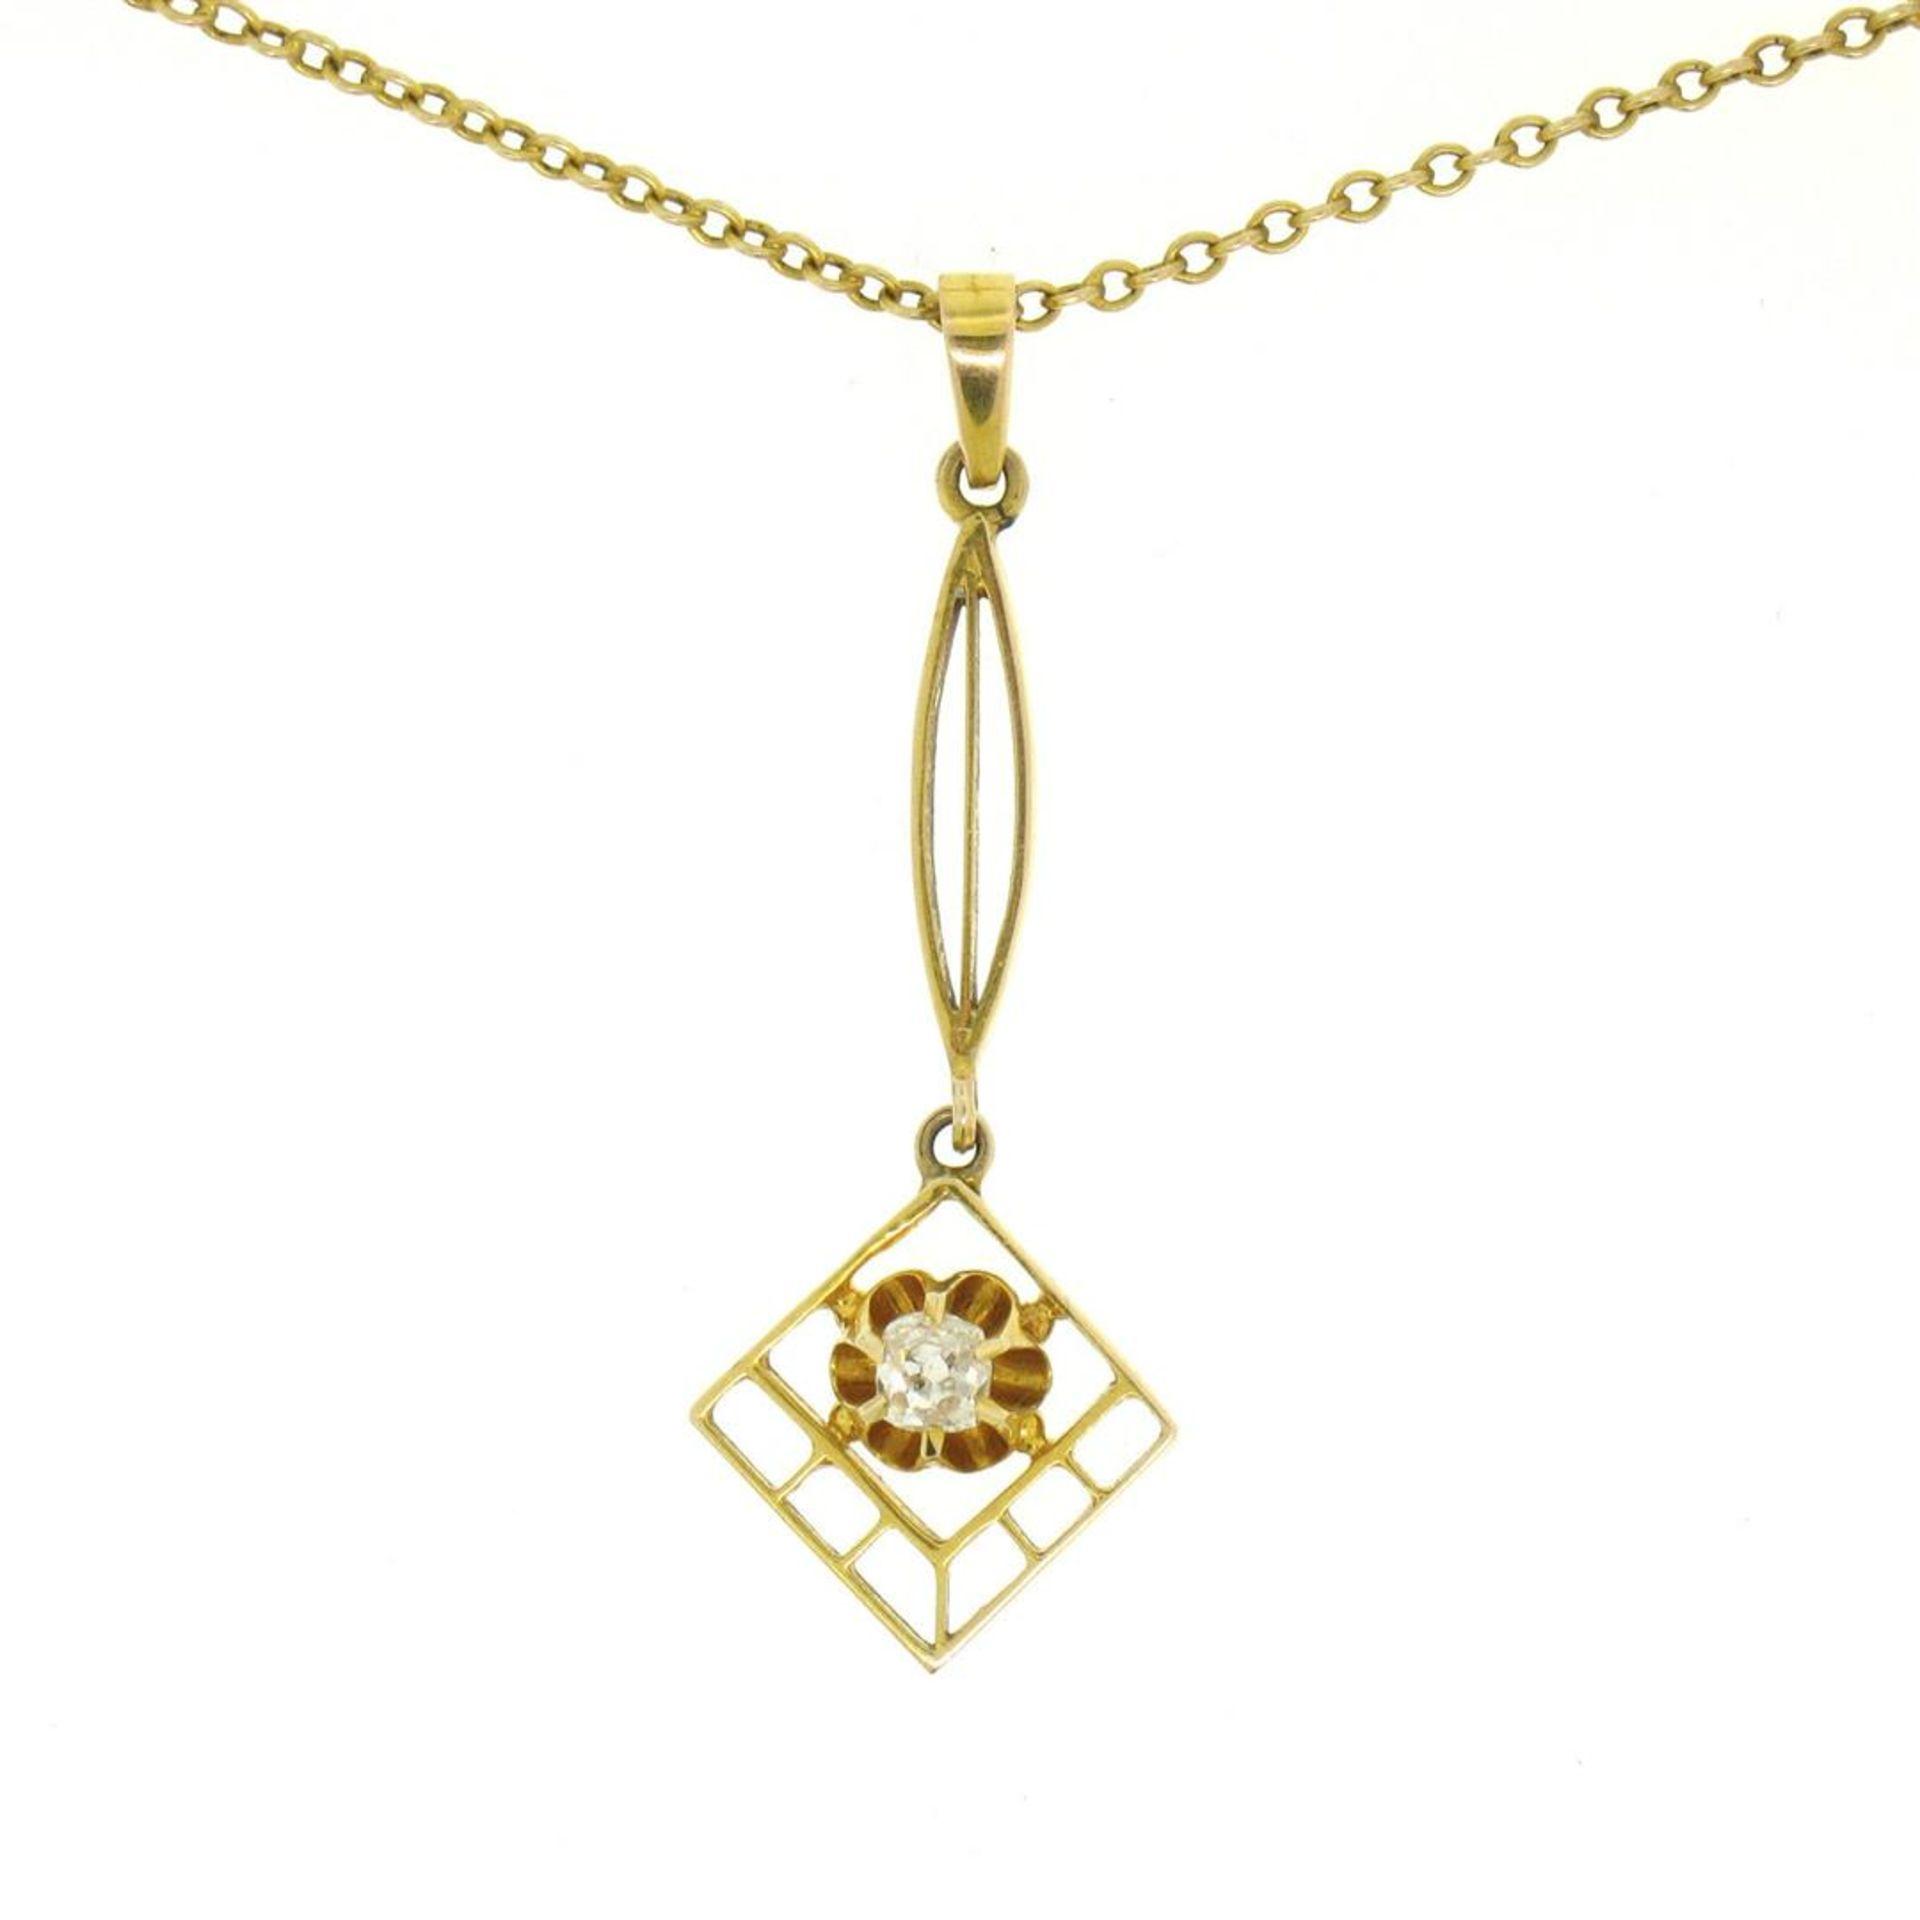 14k Gold Cushion Mine Cut Diamond Lavalier Pendant - Image 3 of 7